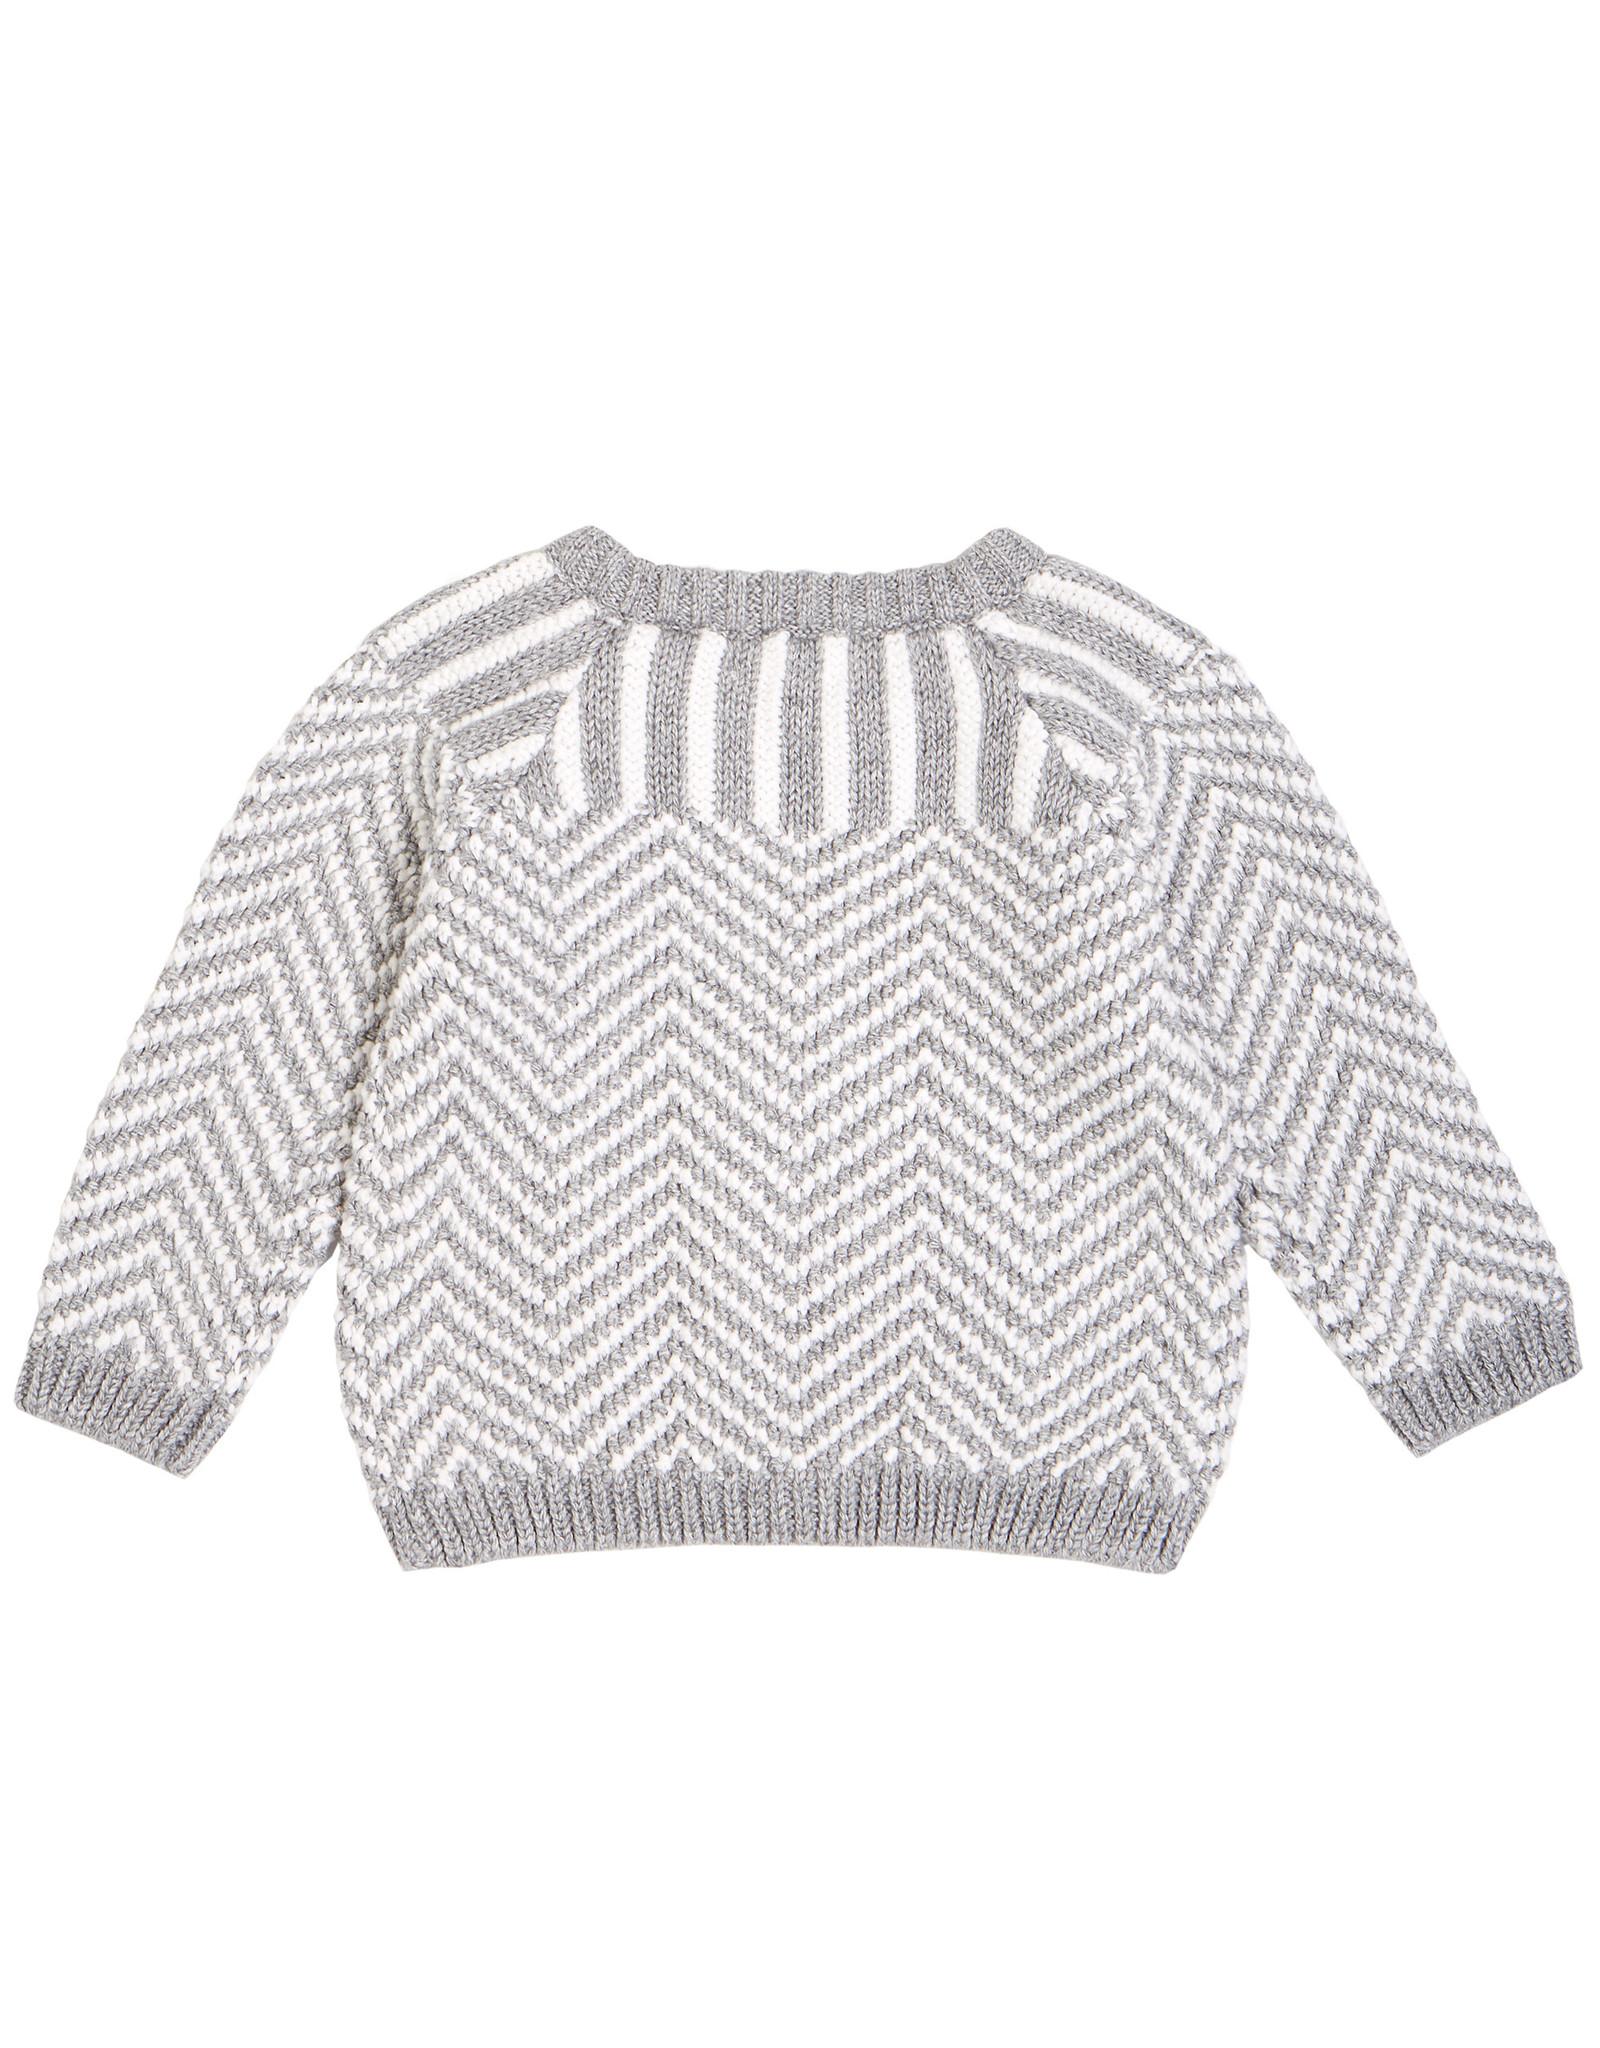 Snowday Sweater